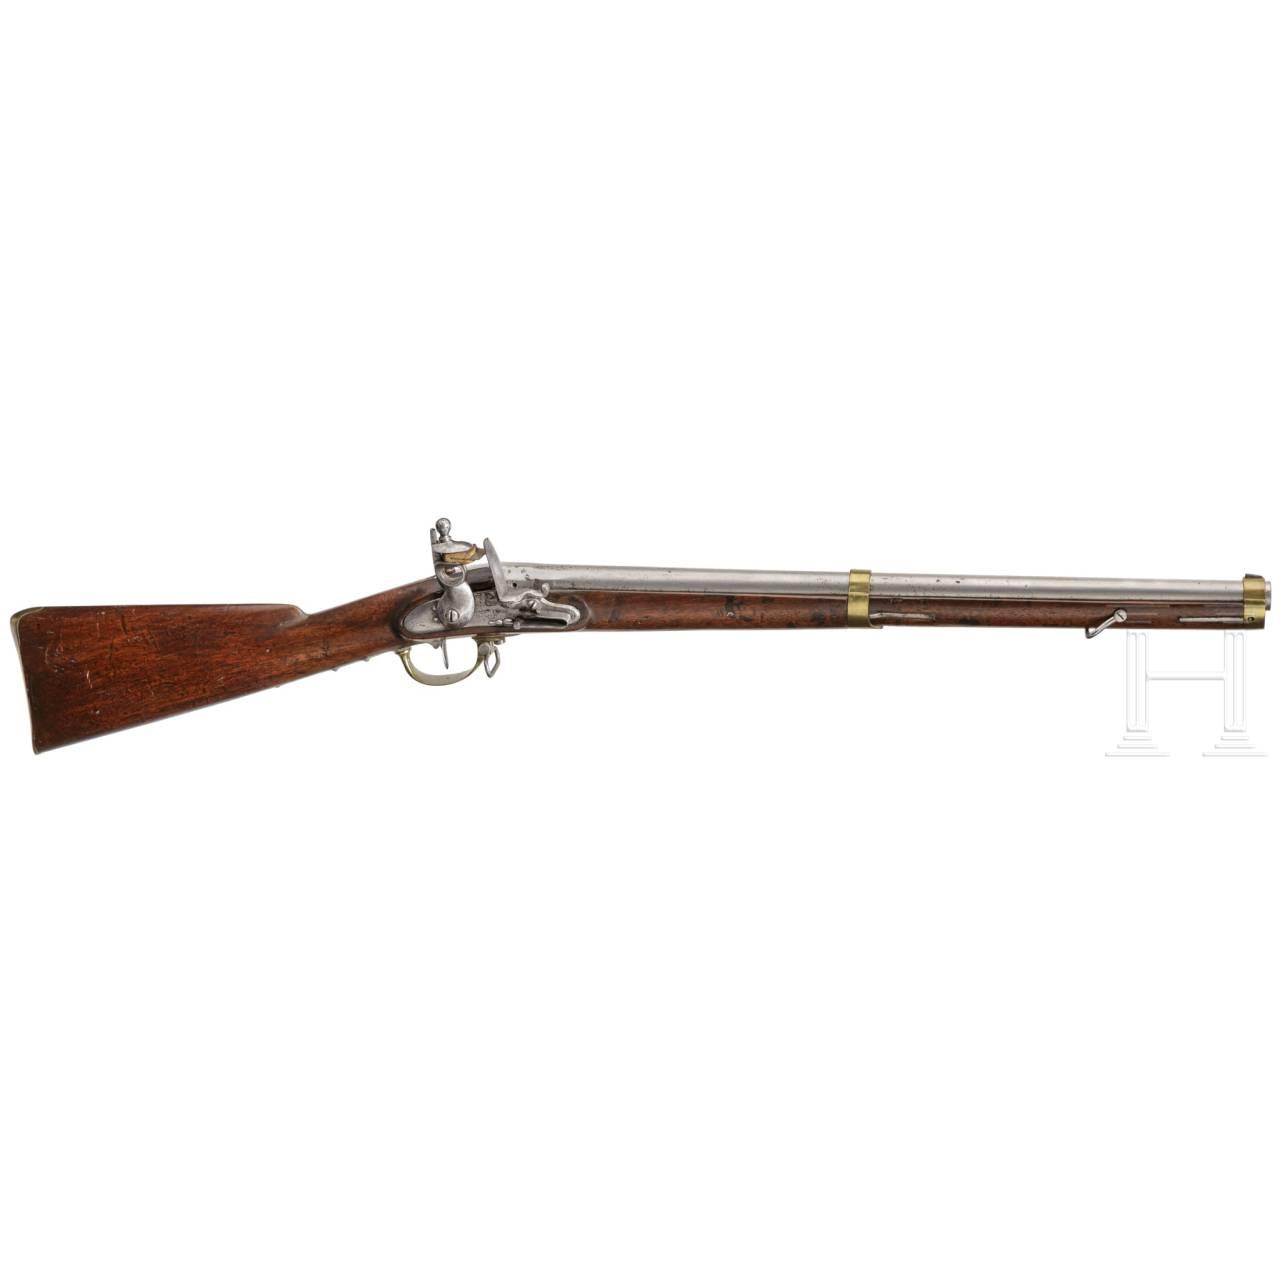 A flintlock musket, beginning of the 19th century